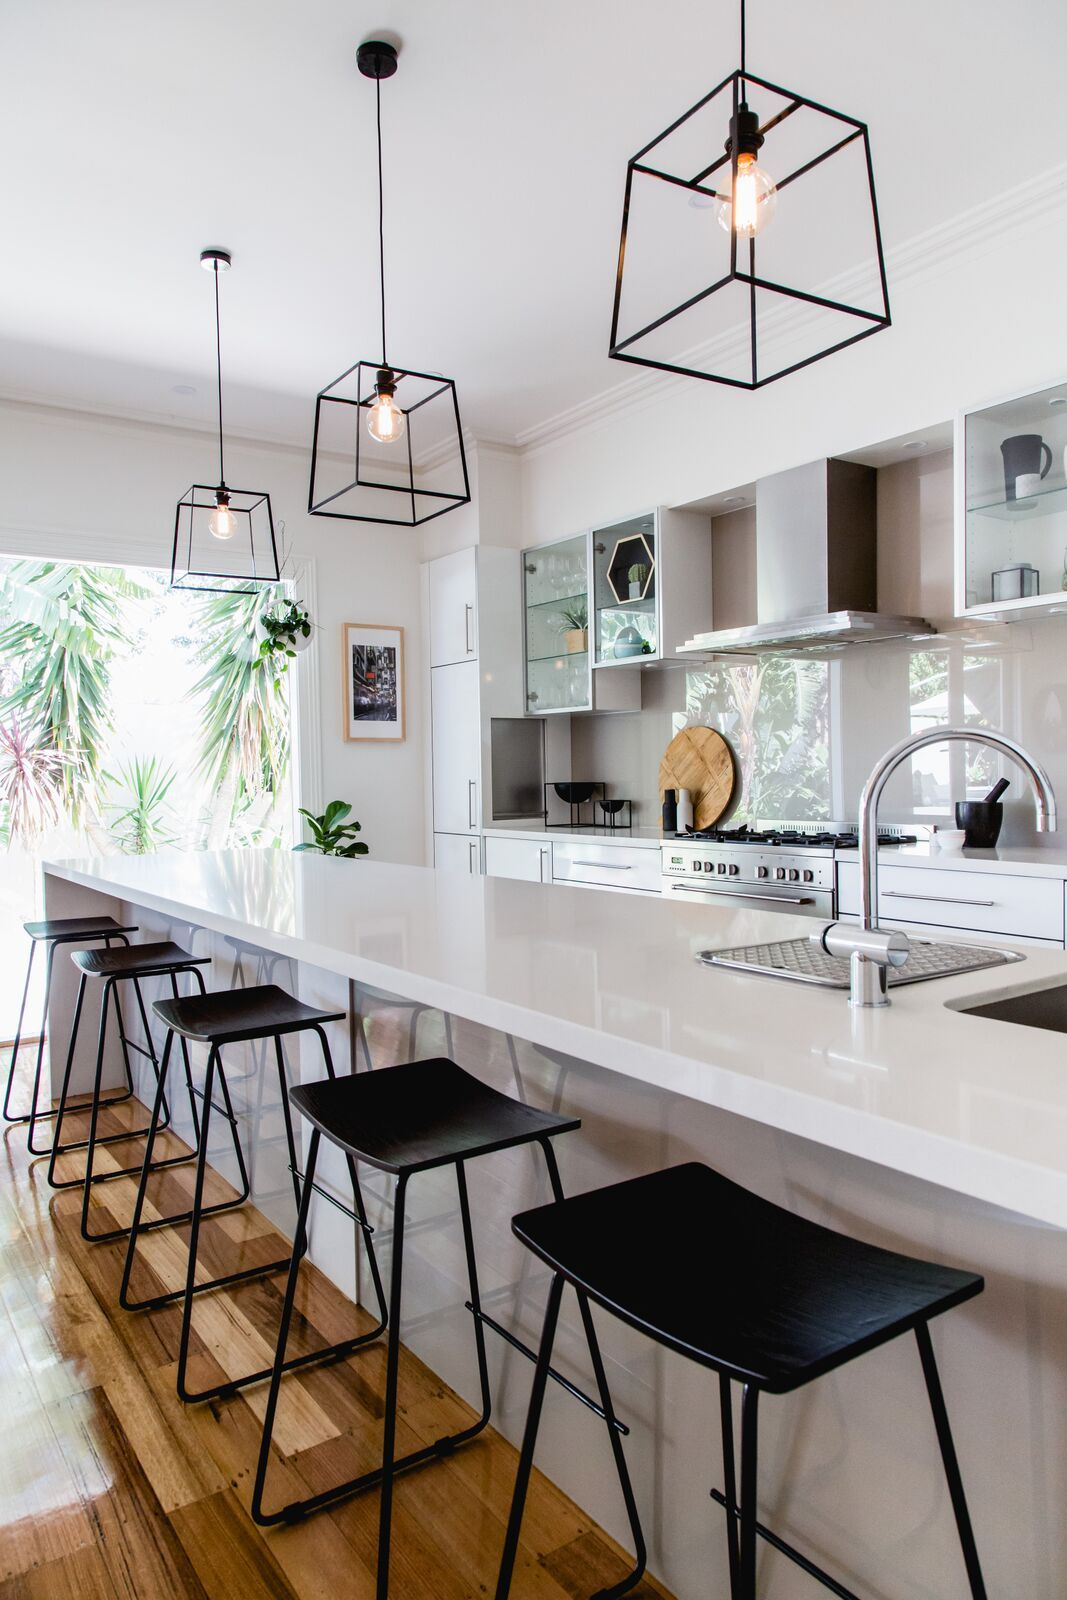 Kitchen Bar Lights Black Sink Barstools Bask Interiors Stools Counter In Pendants Breakfast Pendant